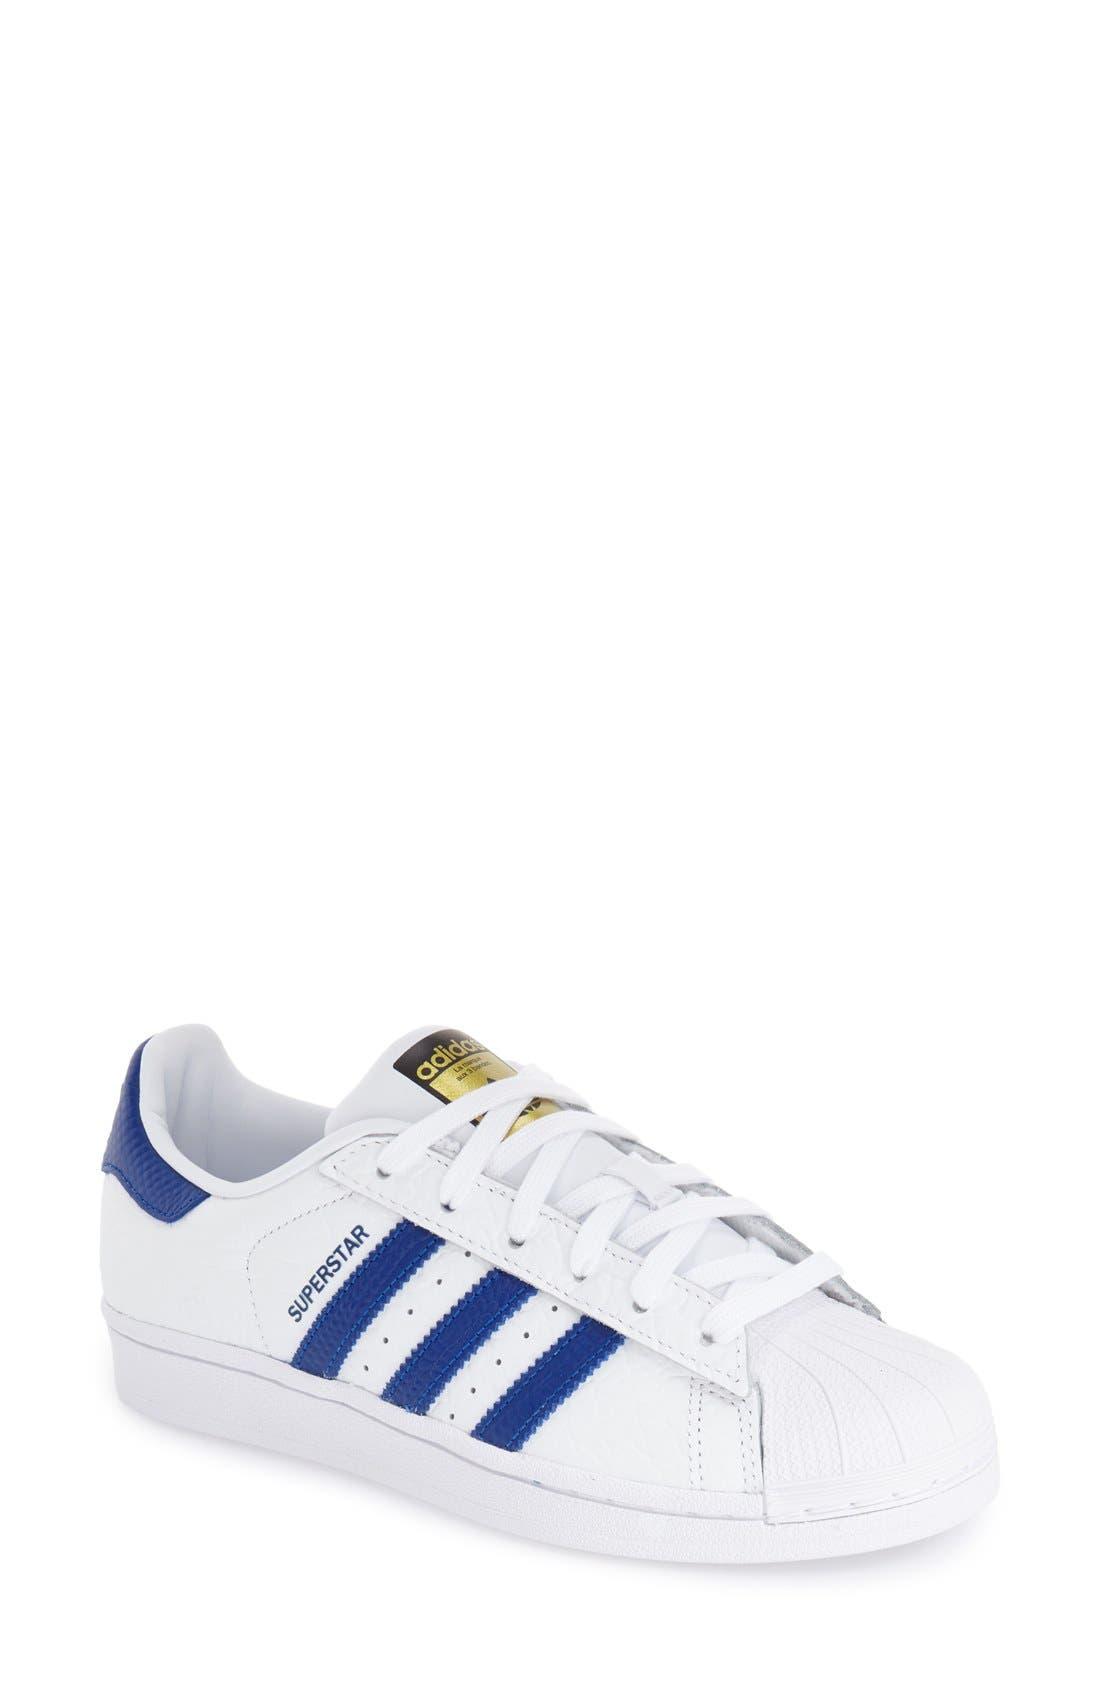 Main Image - adidas 'Superstar' Sneaker (Women)